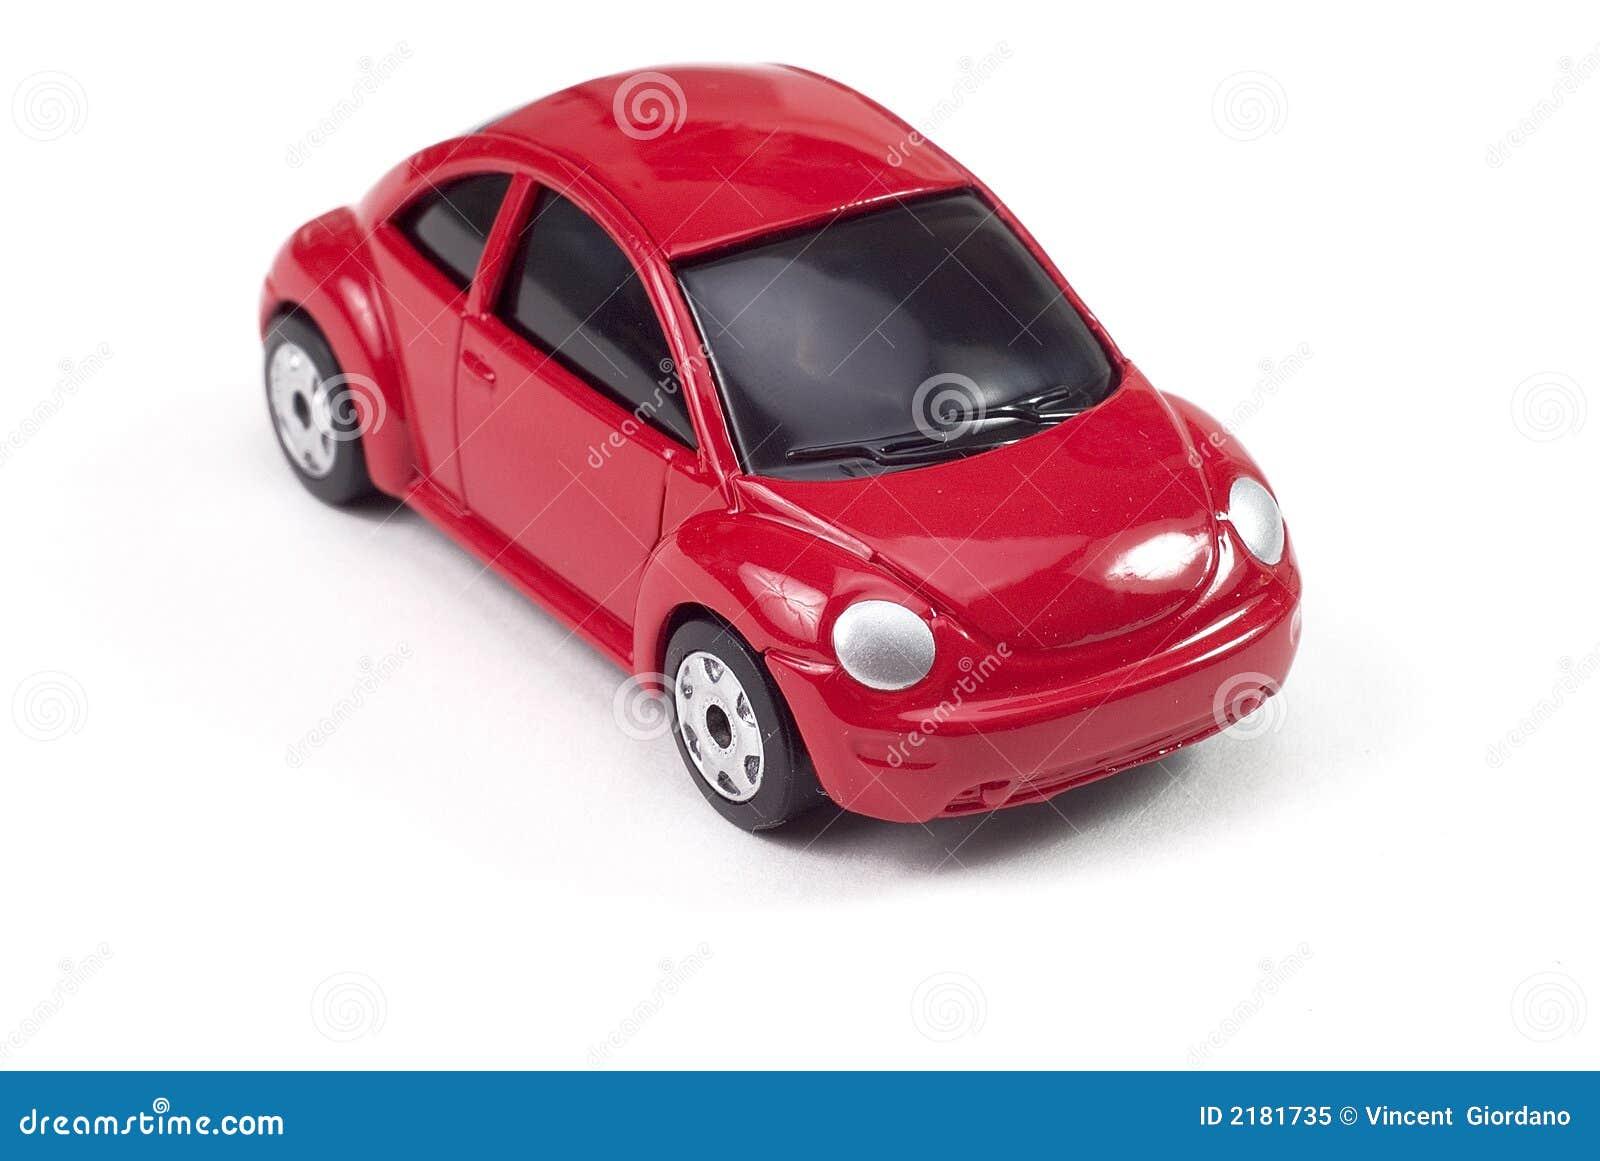 Fun To Drive Economy Cars